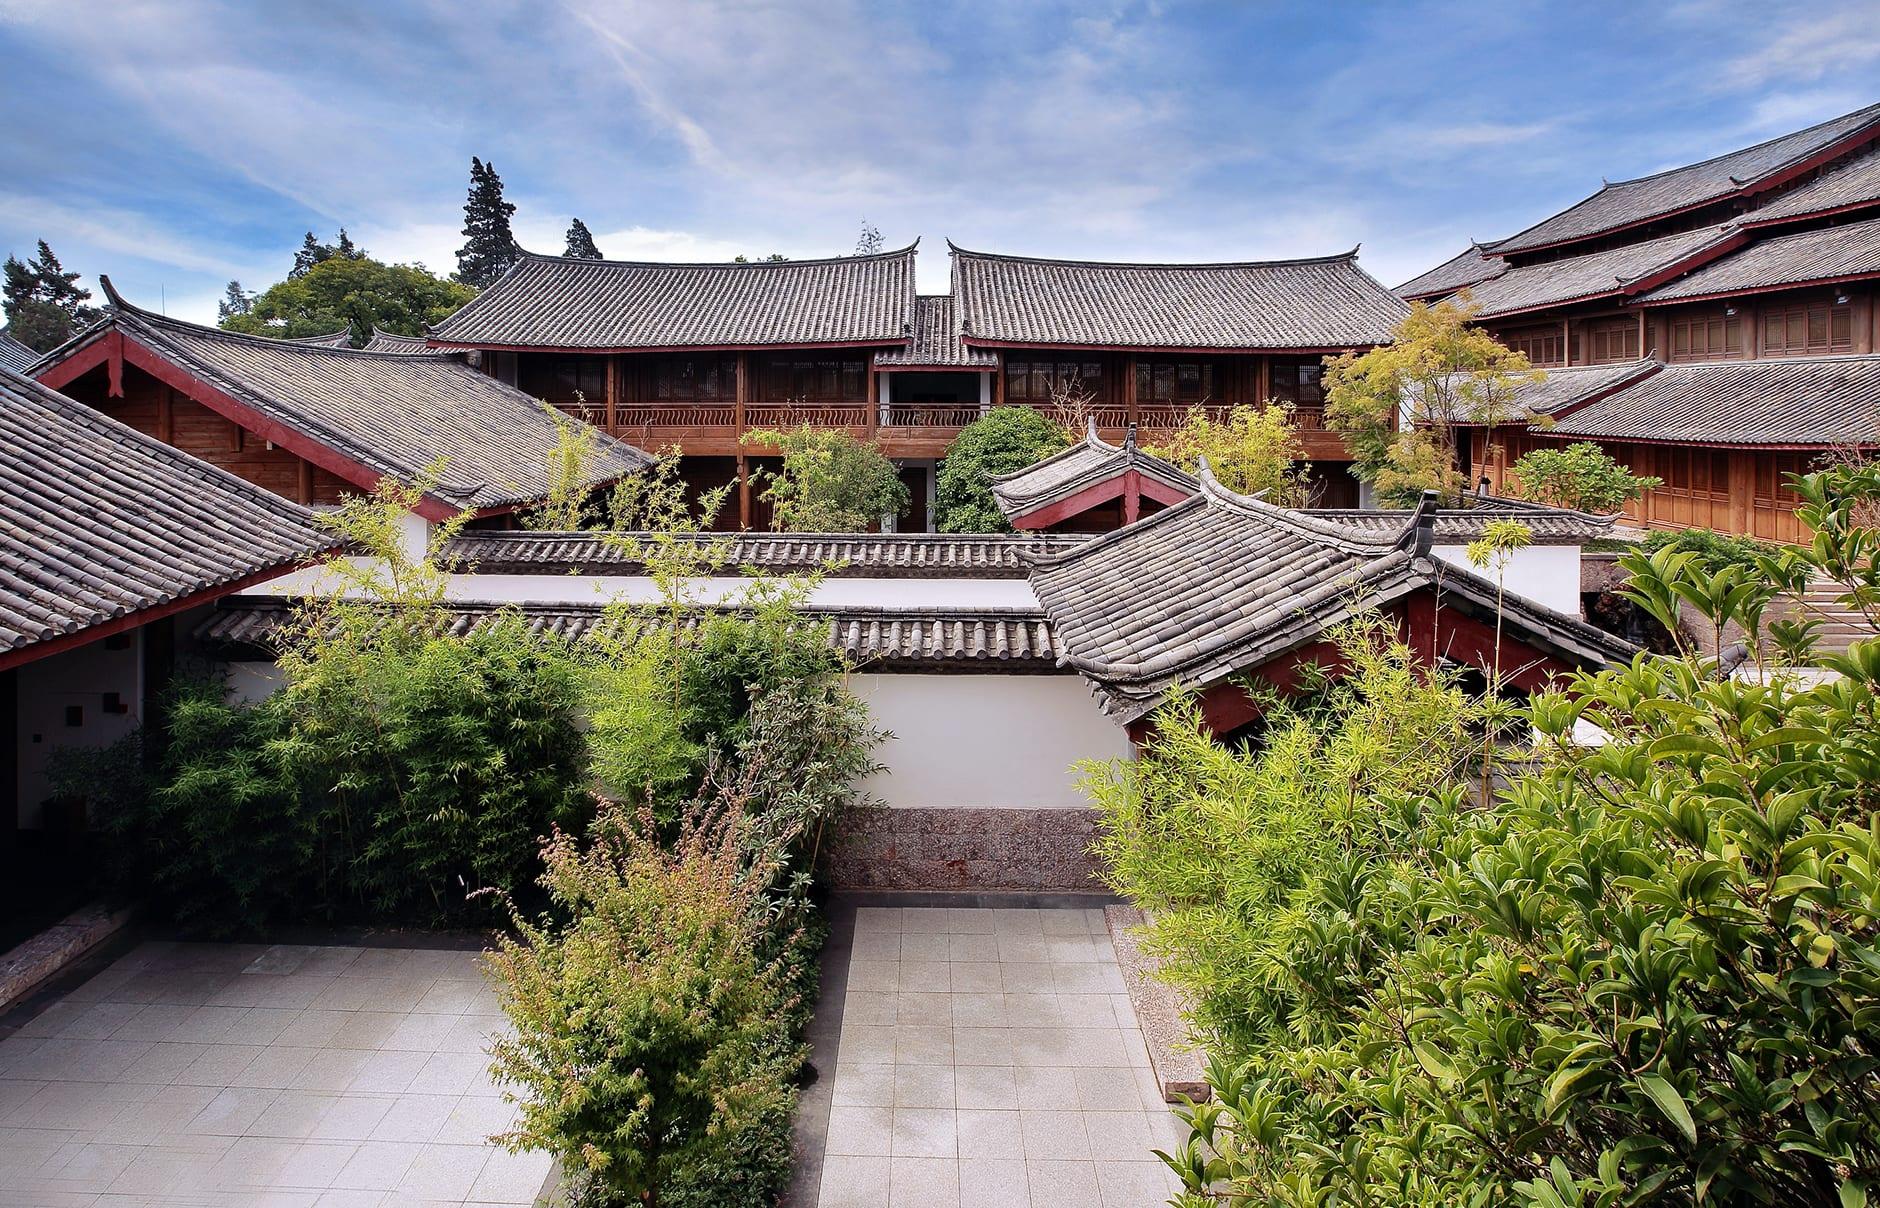 Amandayan - Courtyard. Amandayan, Lijiang, China. © Amanresorts